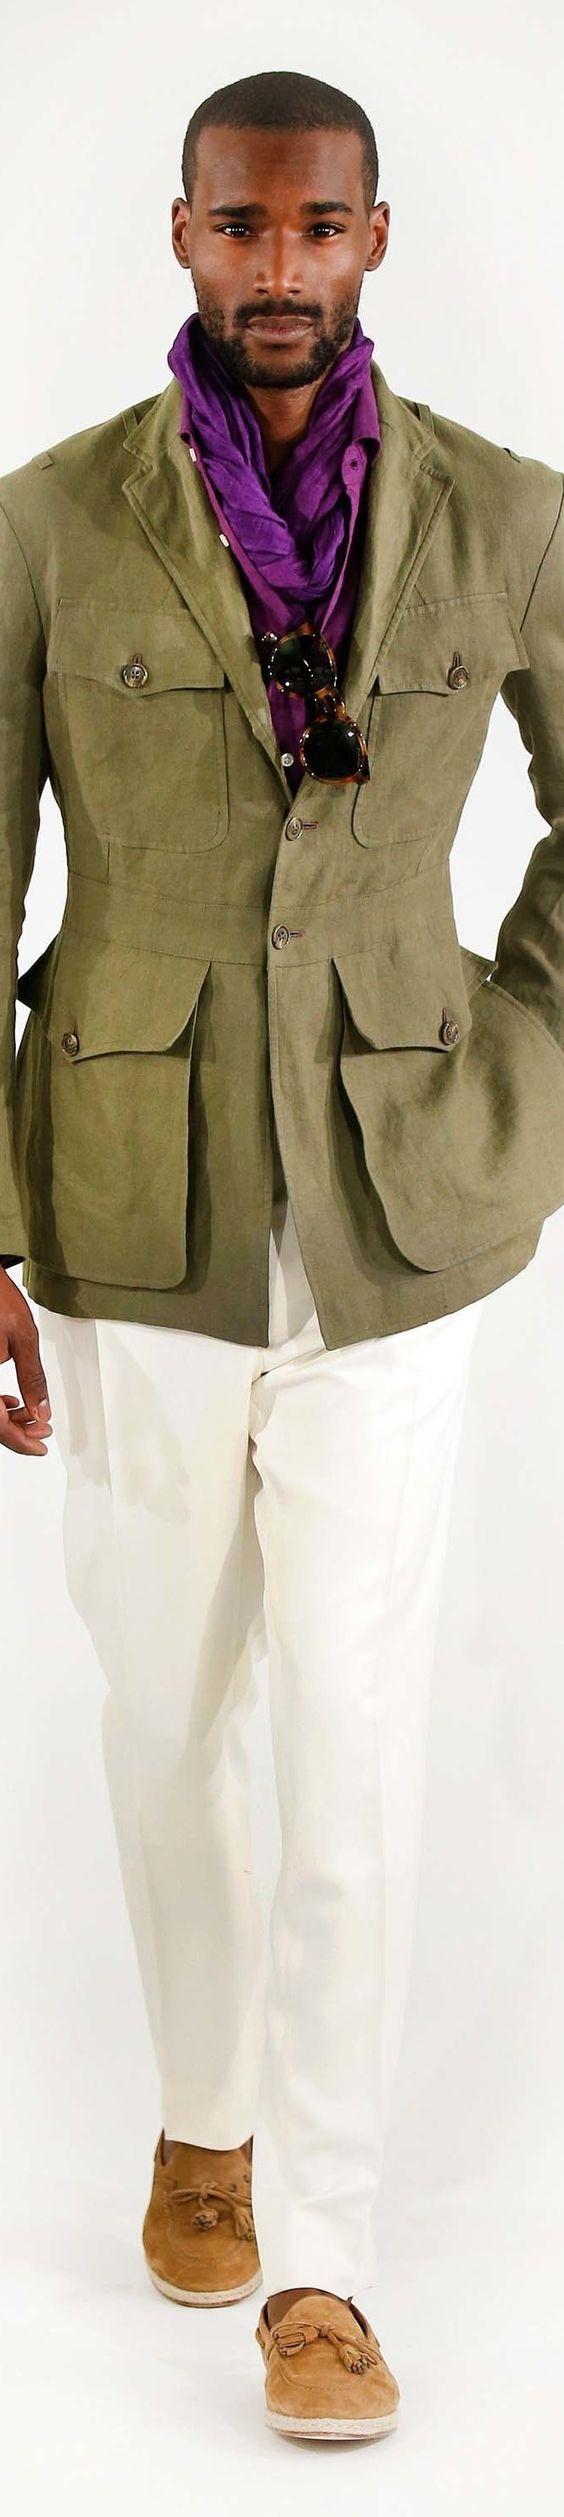 Ralph Lauren Menswear Collection